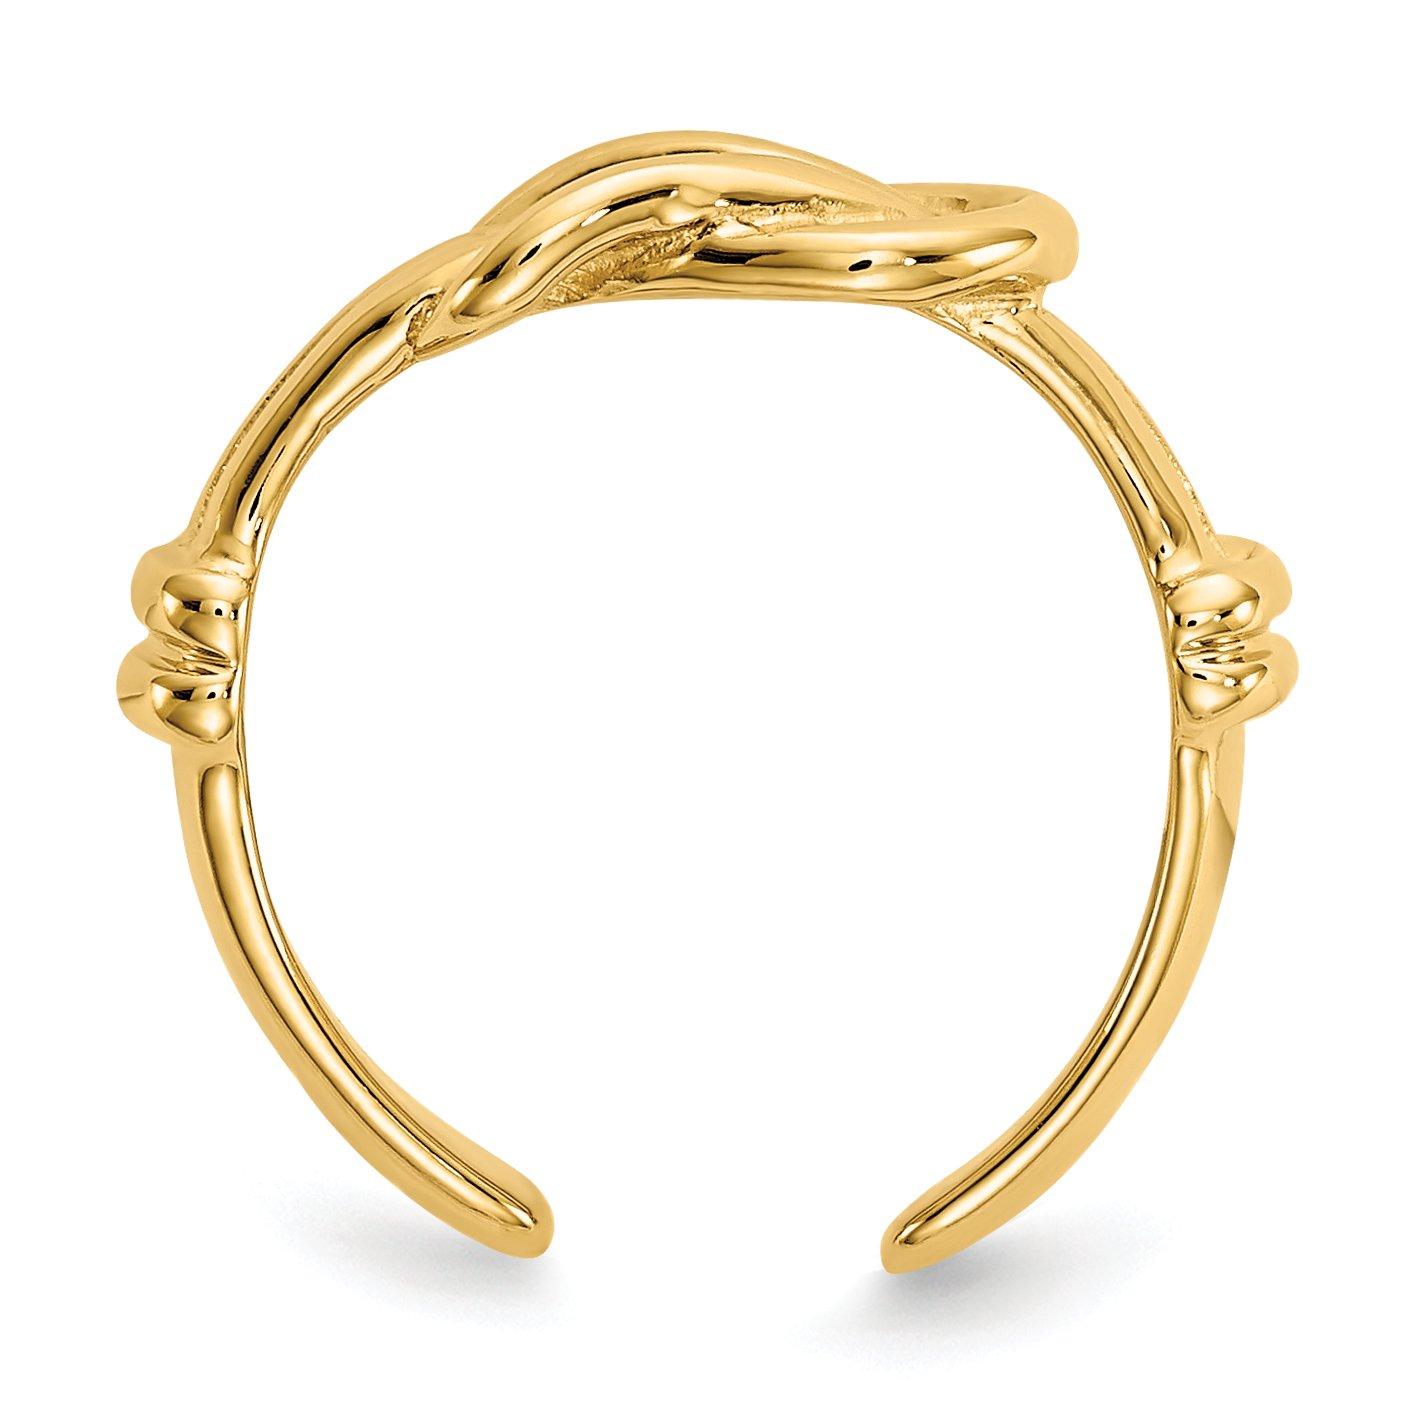 14k Yellow Gold Love Knot Toe Ring Diamond2Deal 70484831